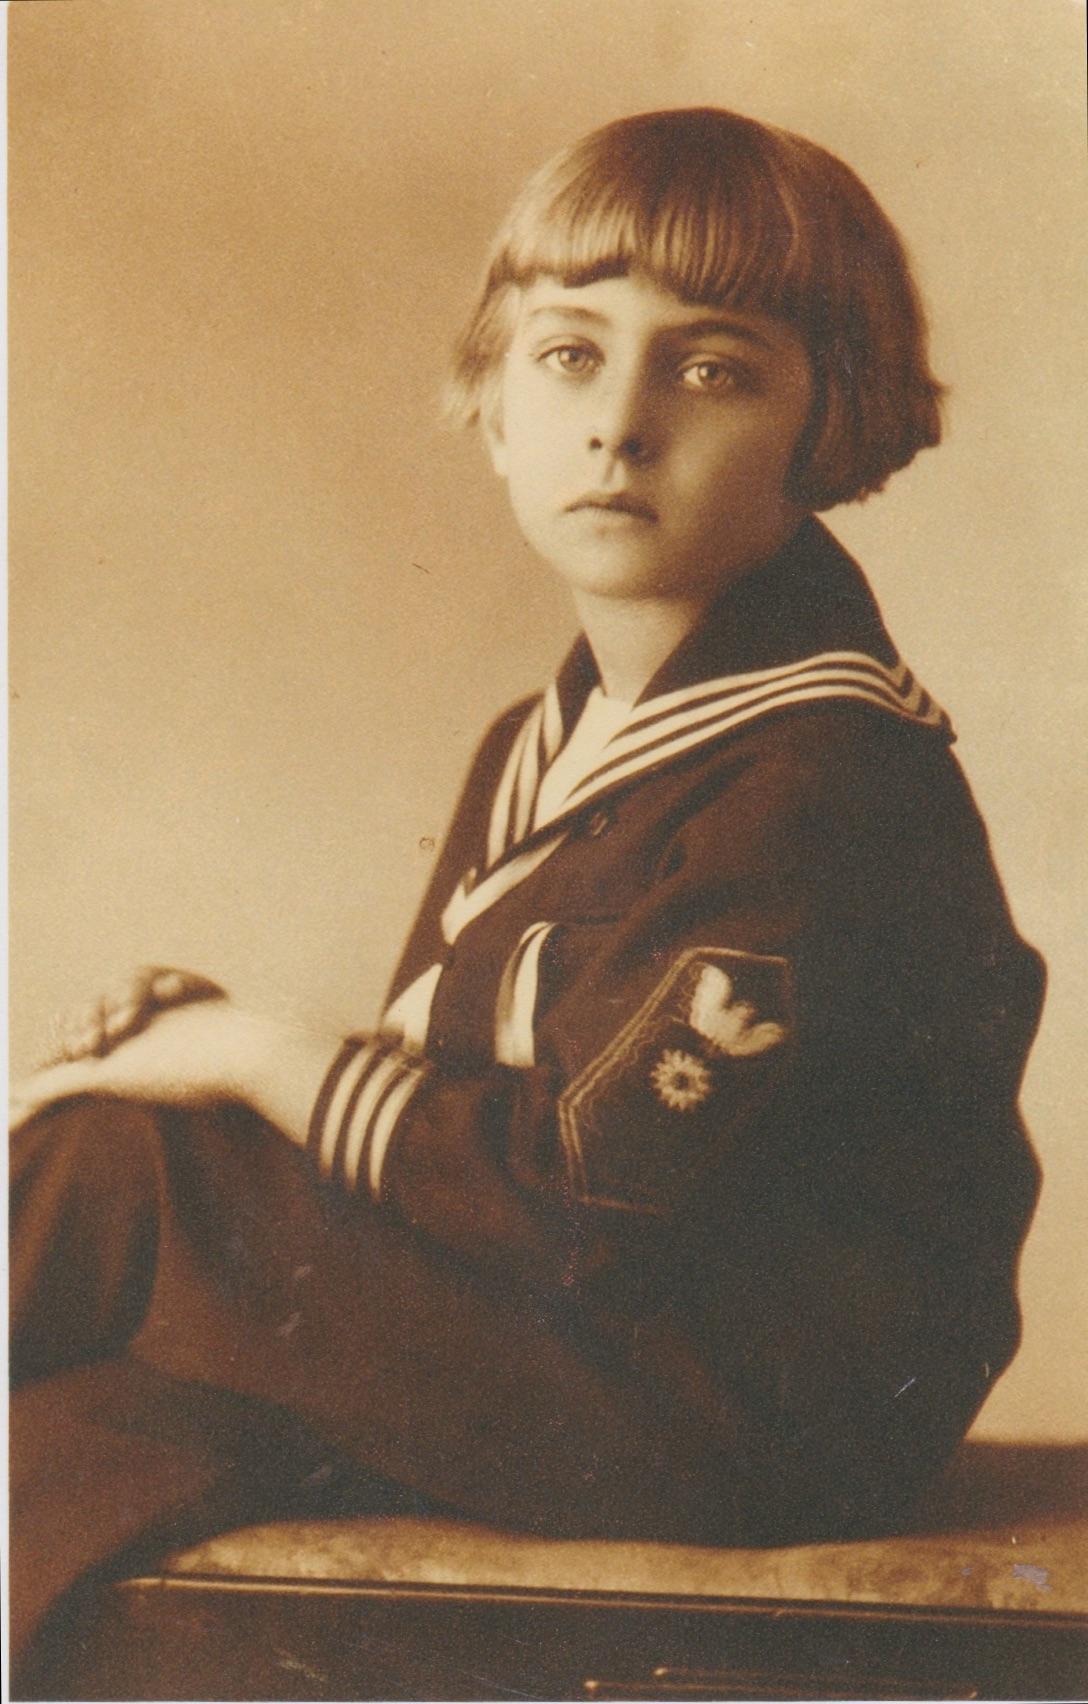 Shura aged 5.